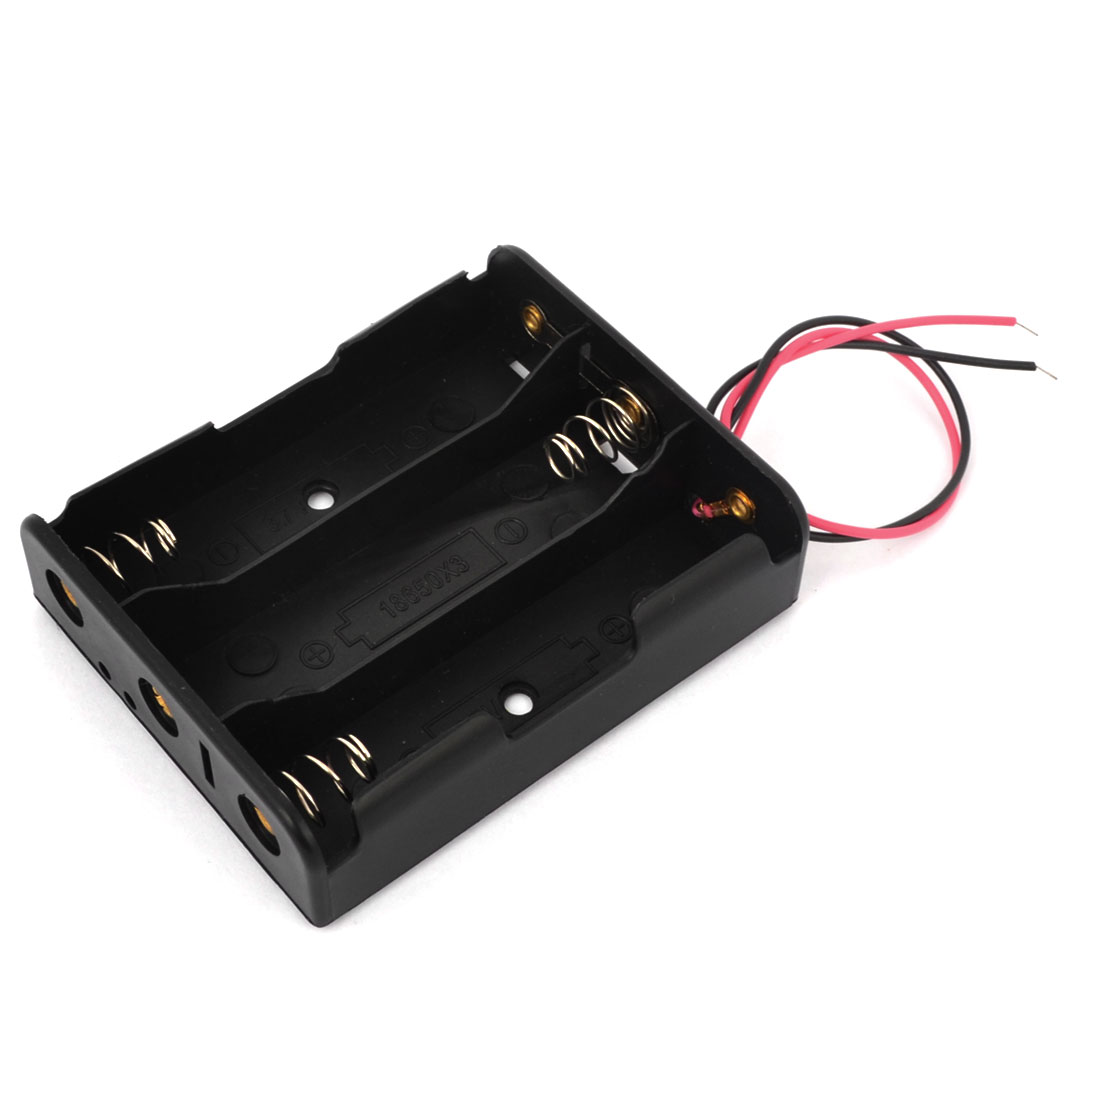 Two Wire Leads Black 3.7V 18650x3 Battery Case Slot Holder Black